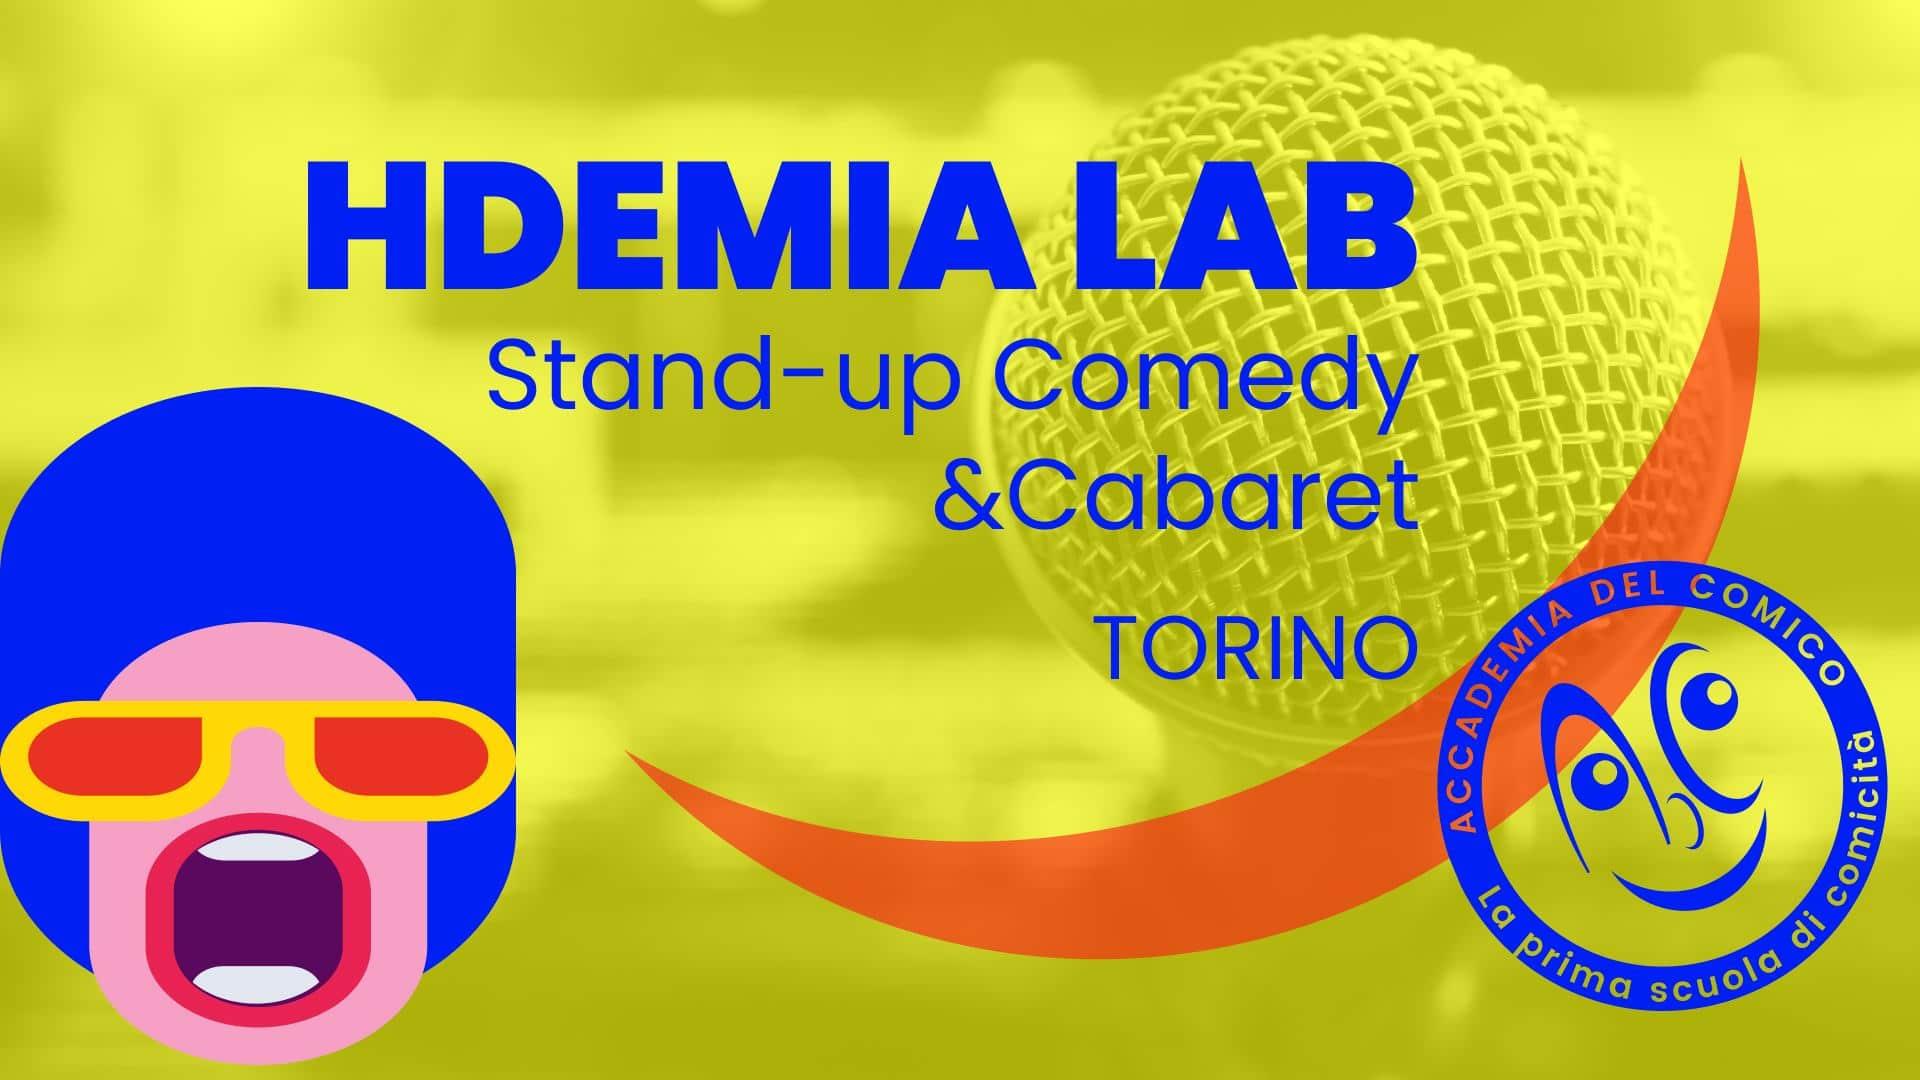 hdemia_lab